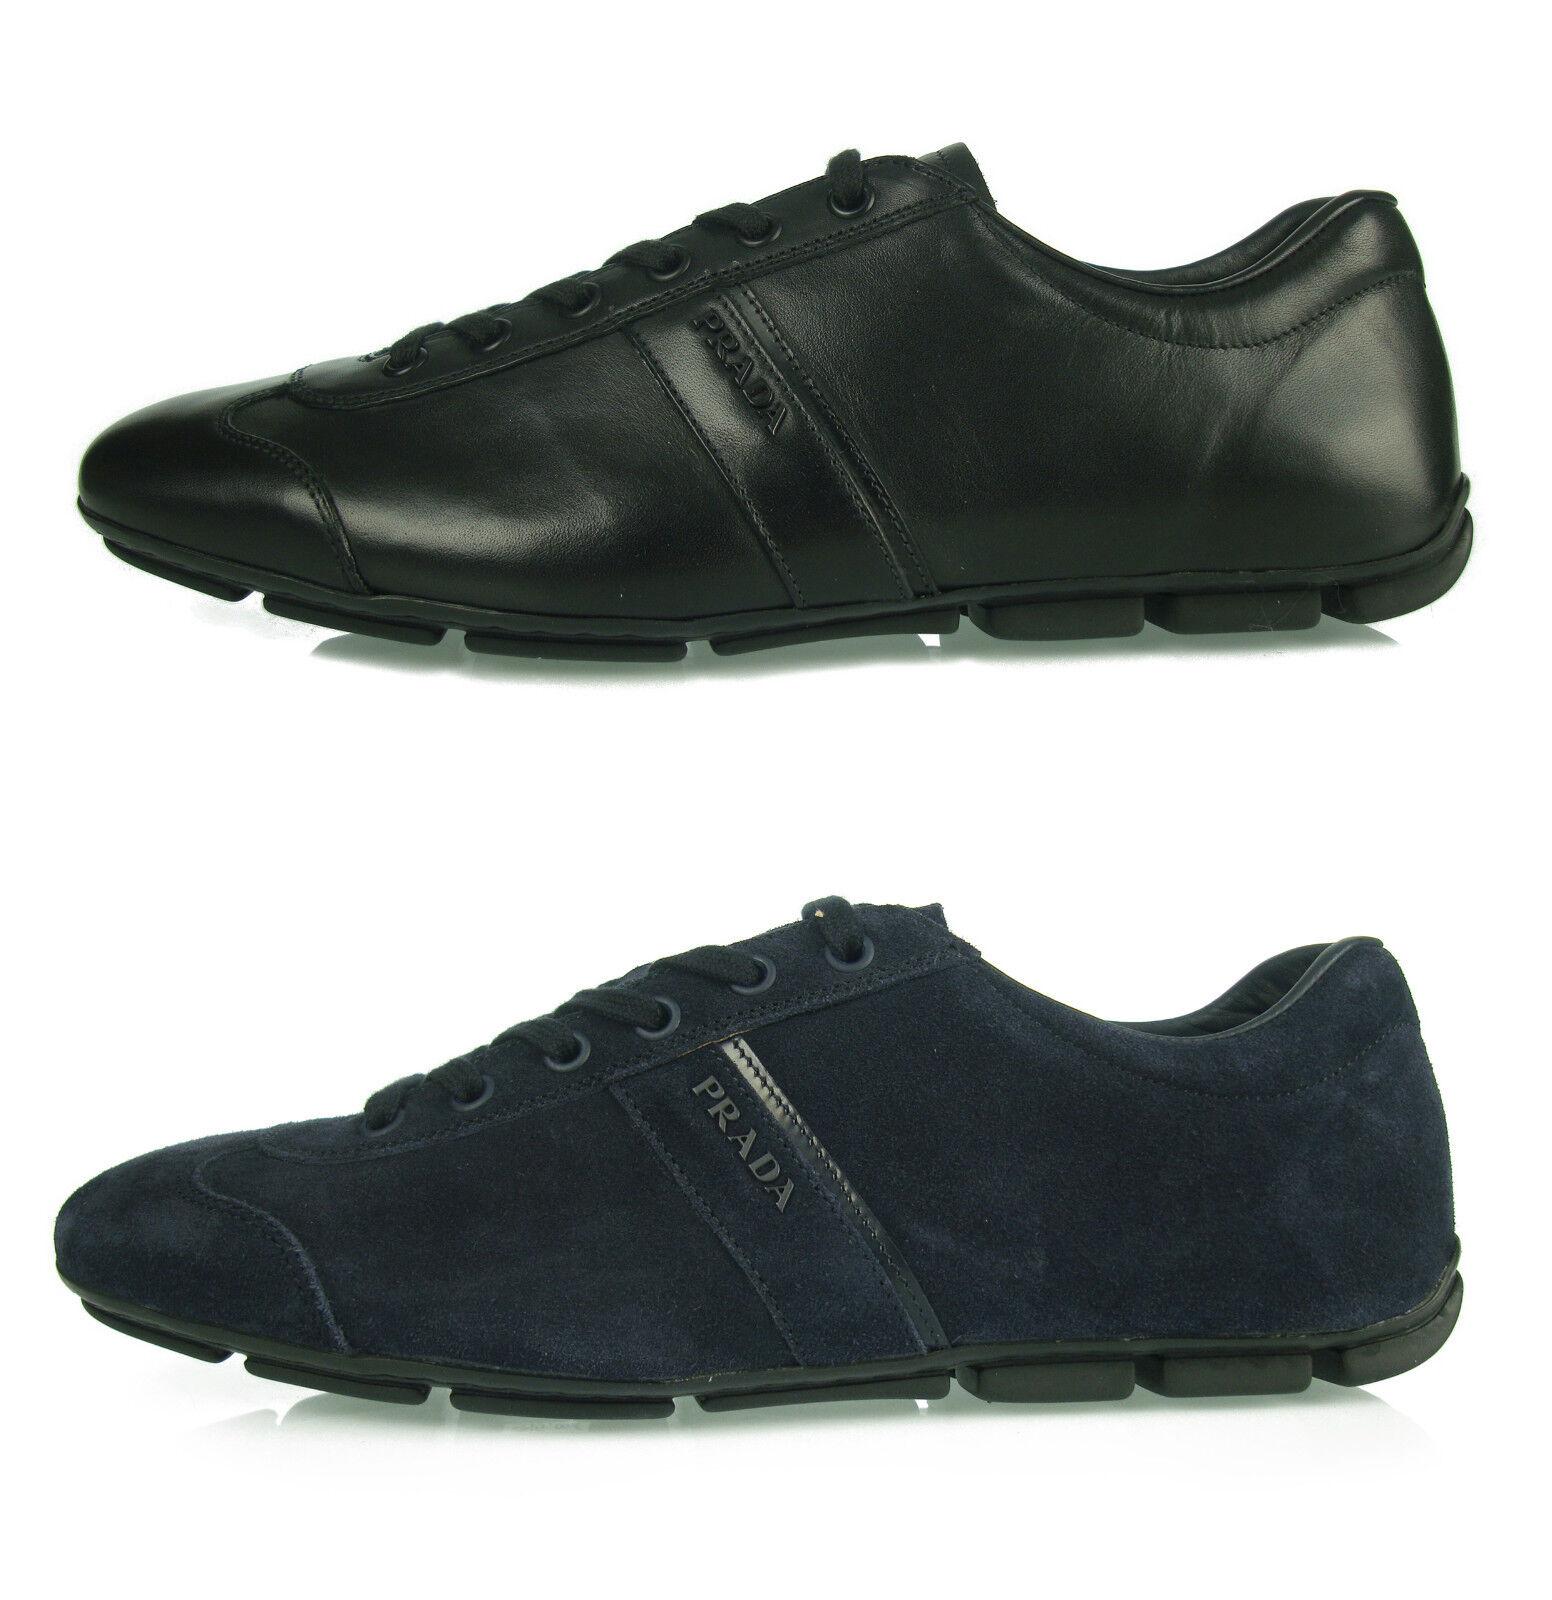 C1 495 PRADA sneakers Zapatos MONTECARLO hombre Zapatos MAN Zapatos sneakers herrenshuhe s 100%AUT. 497987